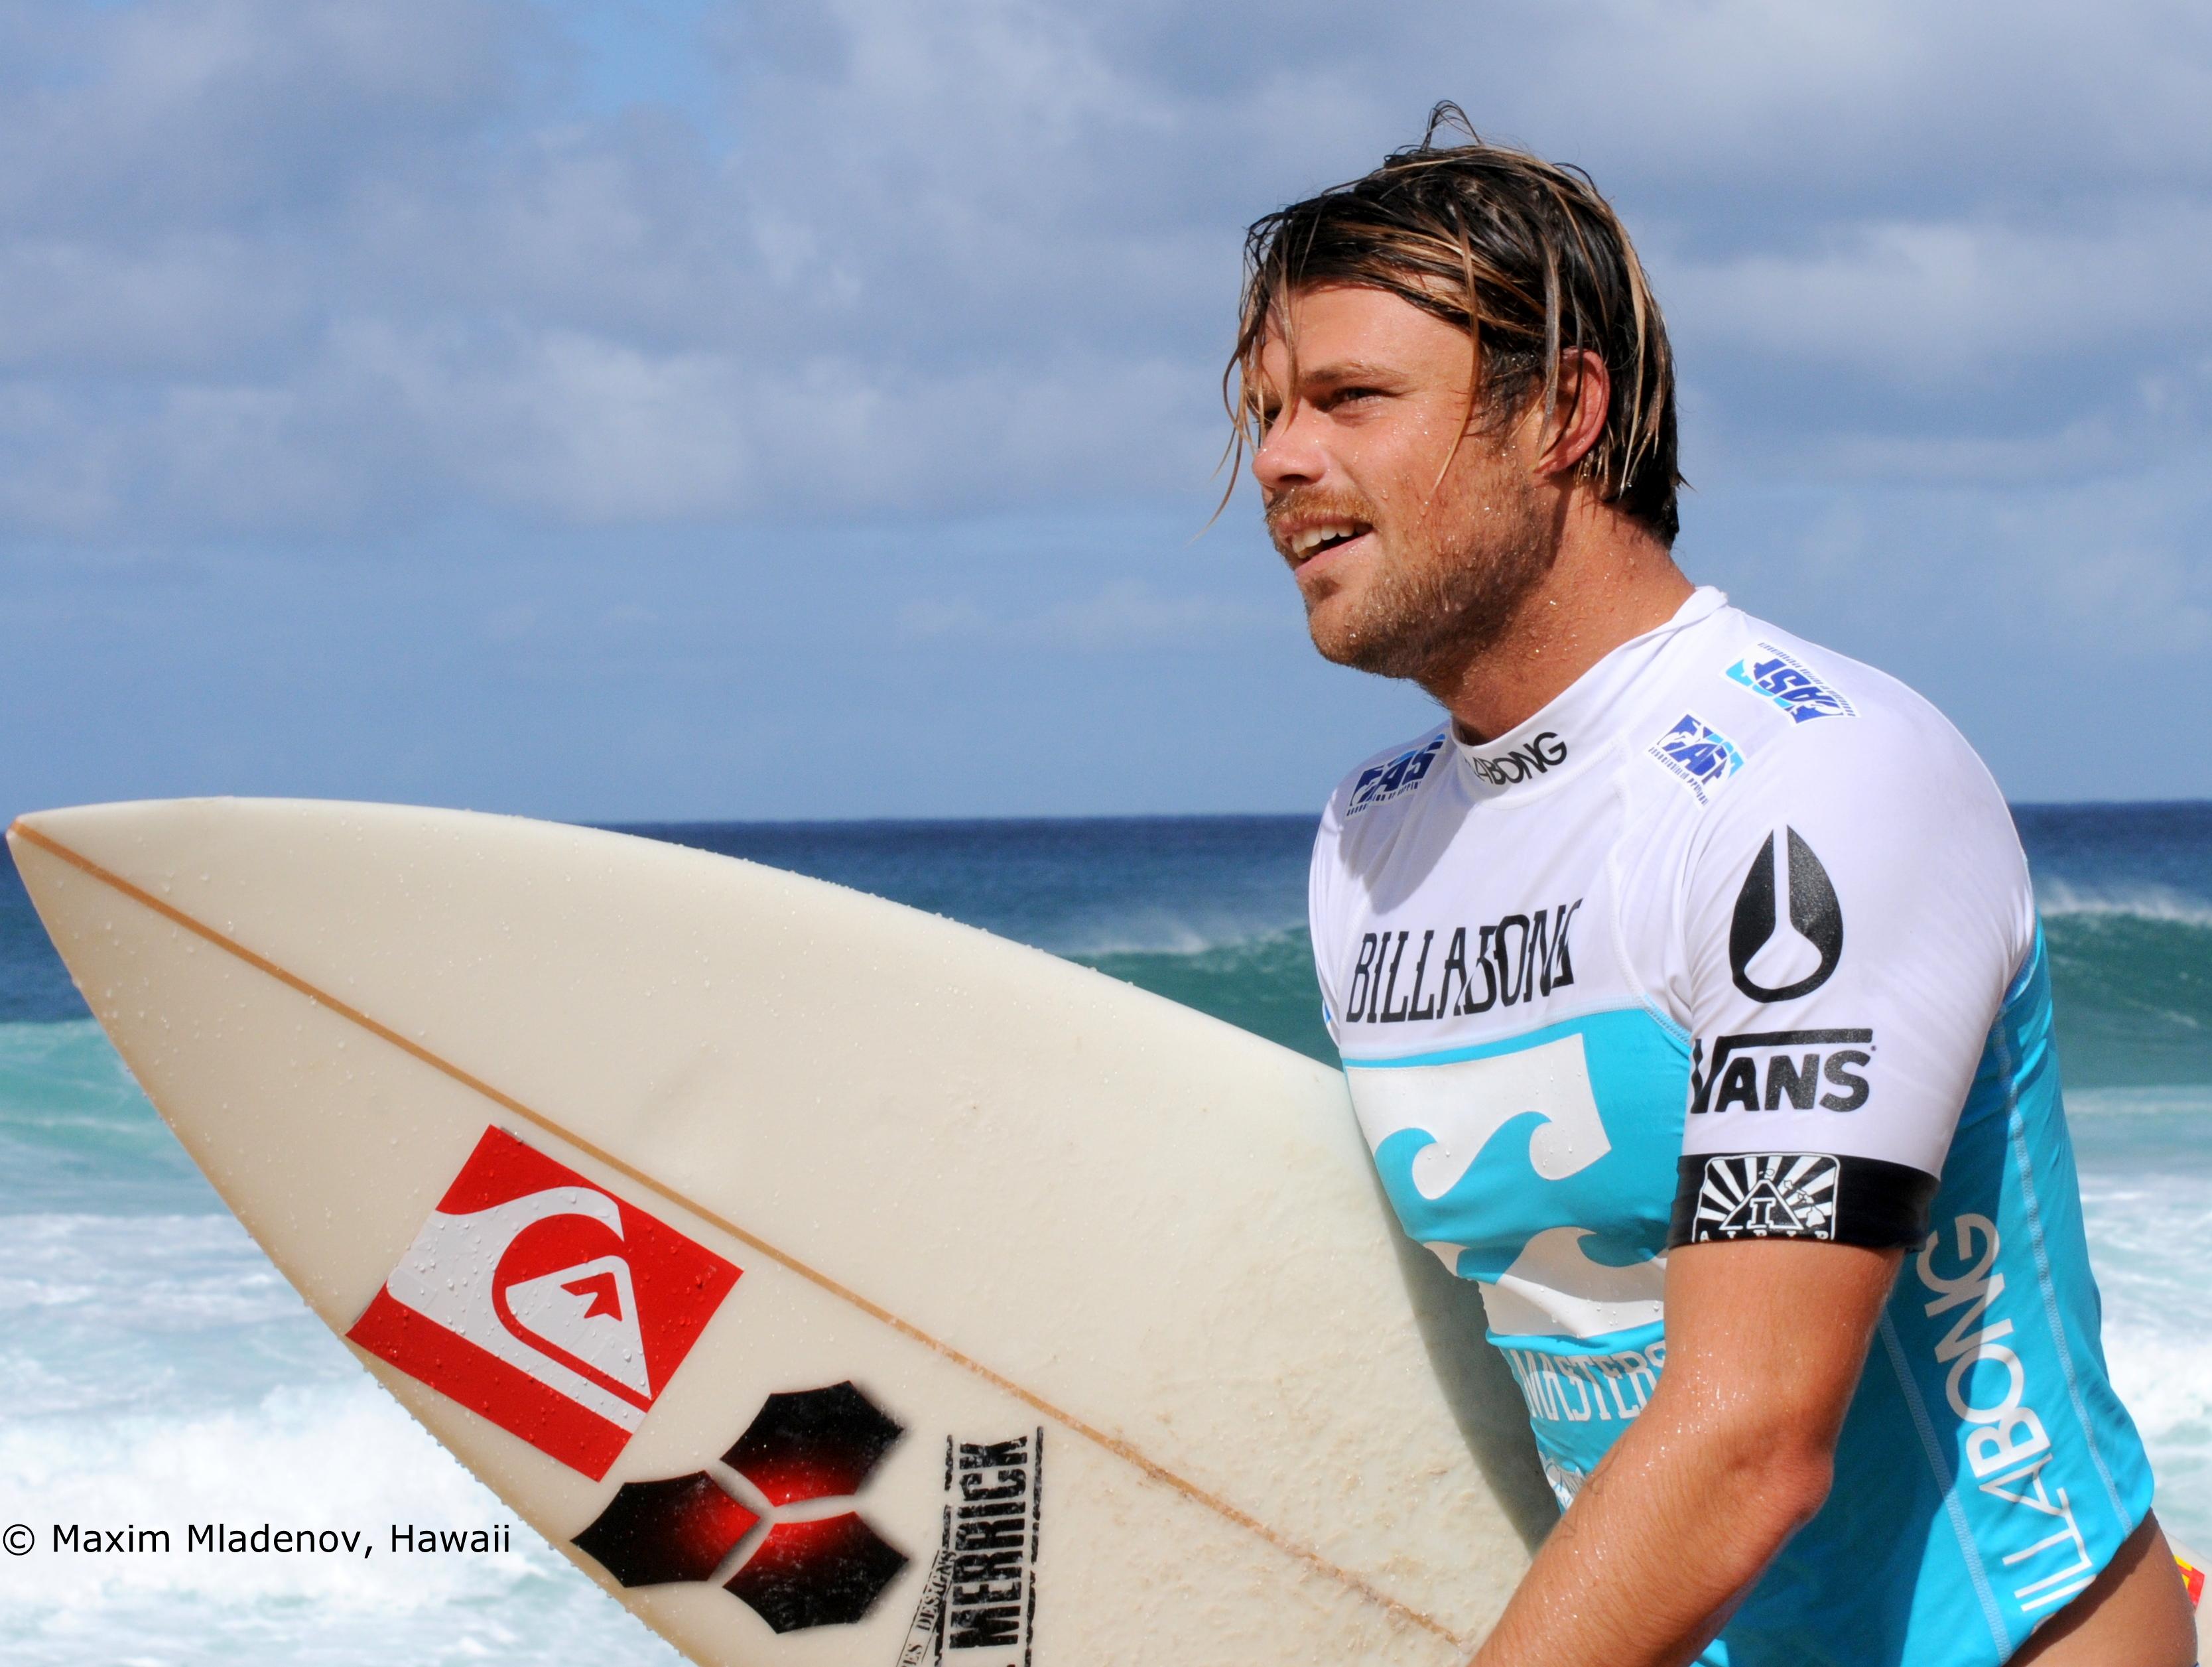 Dane Reynolds fait son dernier contest sur le World Champion Tour, Bravo, on a aimé ton surf Dane © Maxim Mladenov, Hawaii